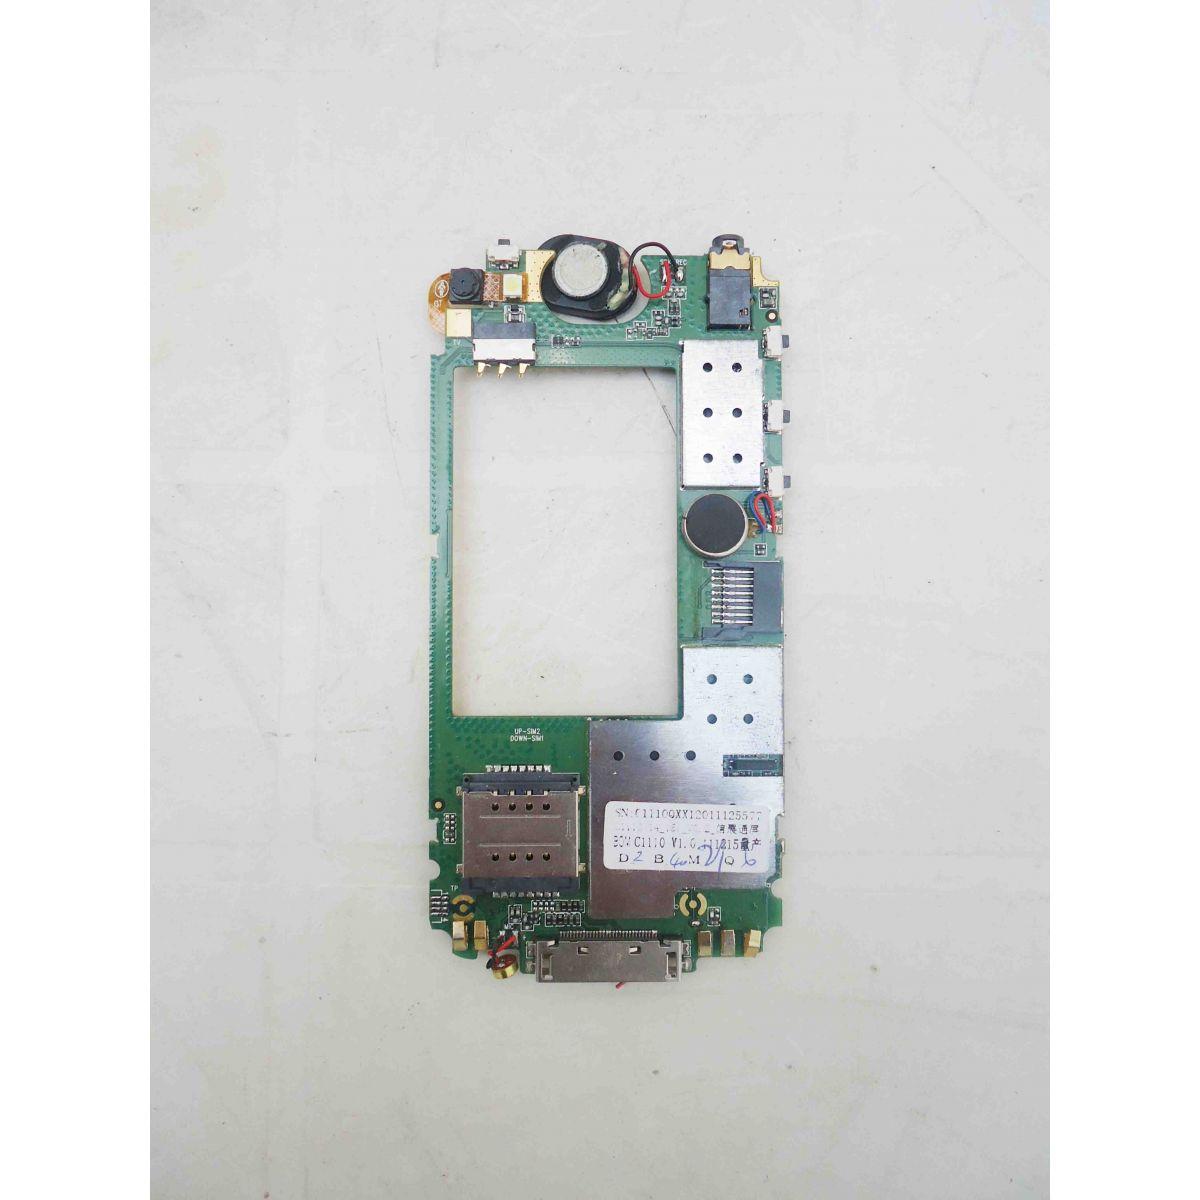 Placa Logica Smartphone Hiphone 4 C1110-MB_REV1.0-111125